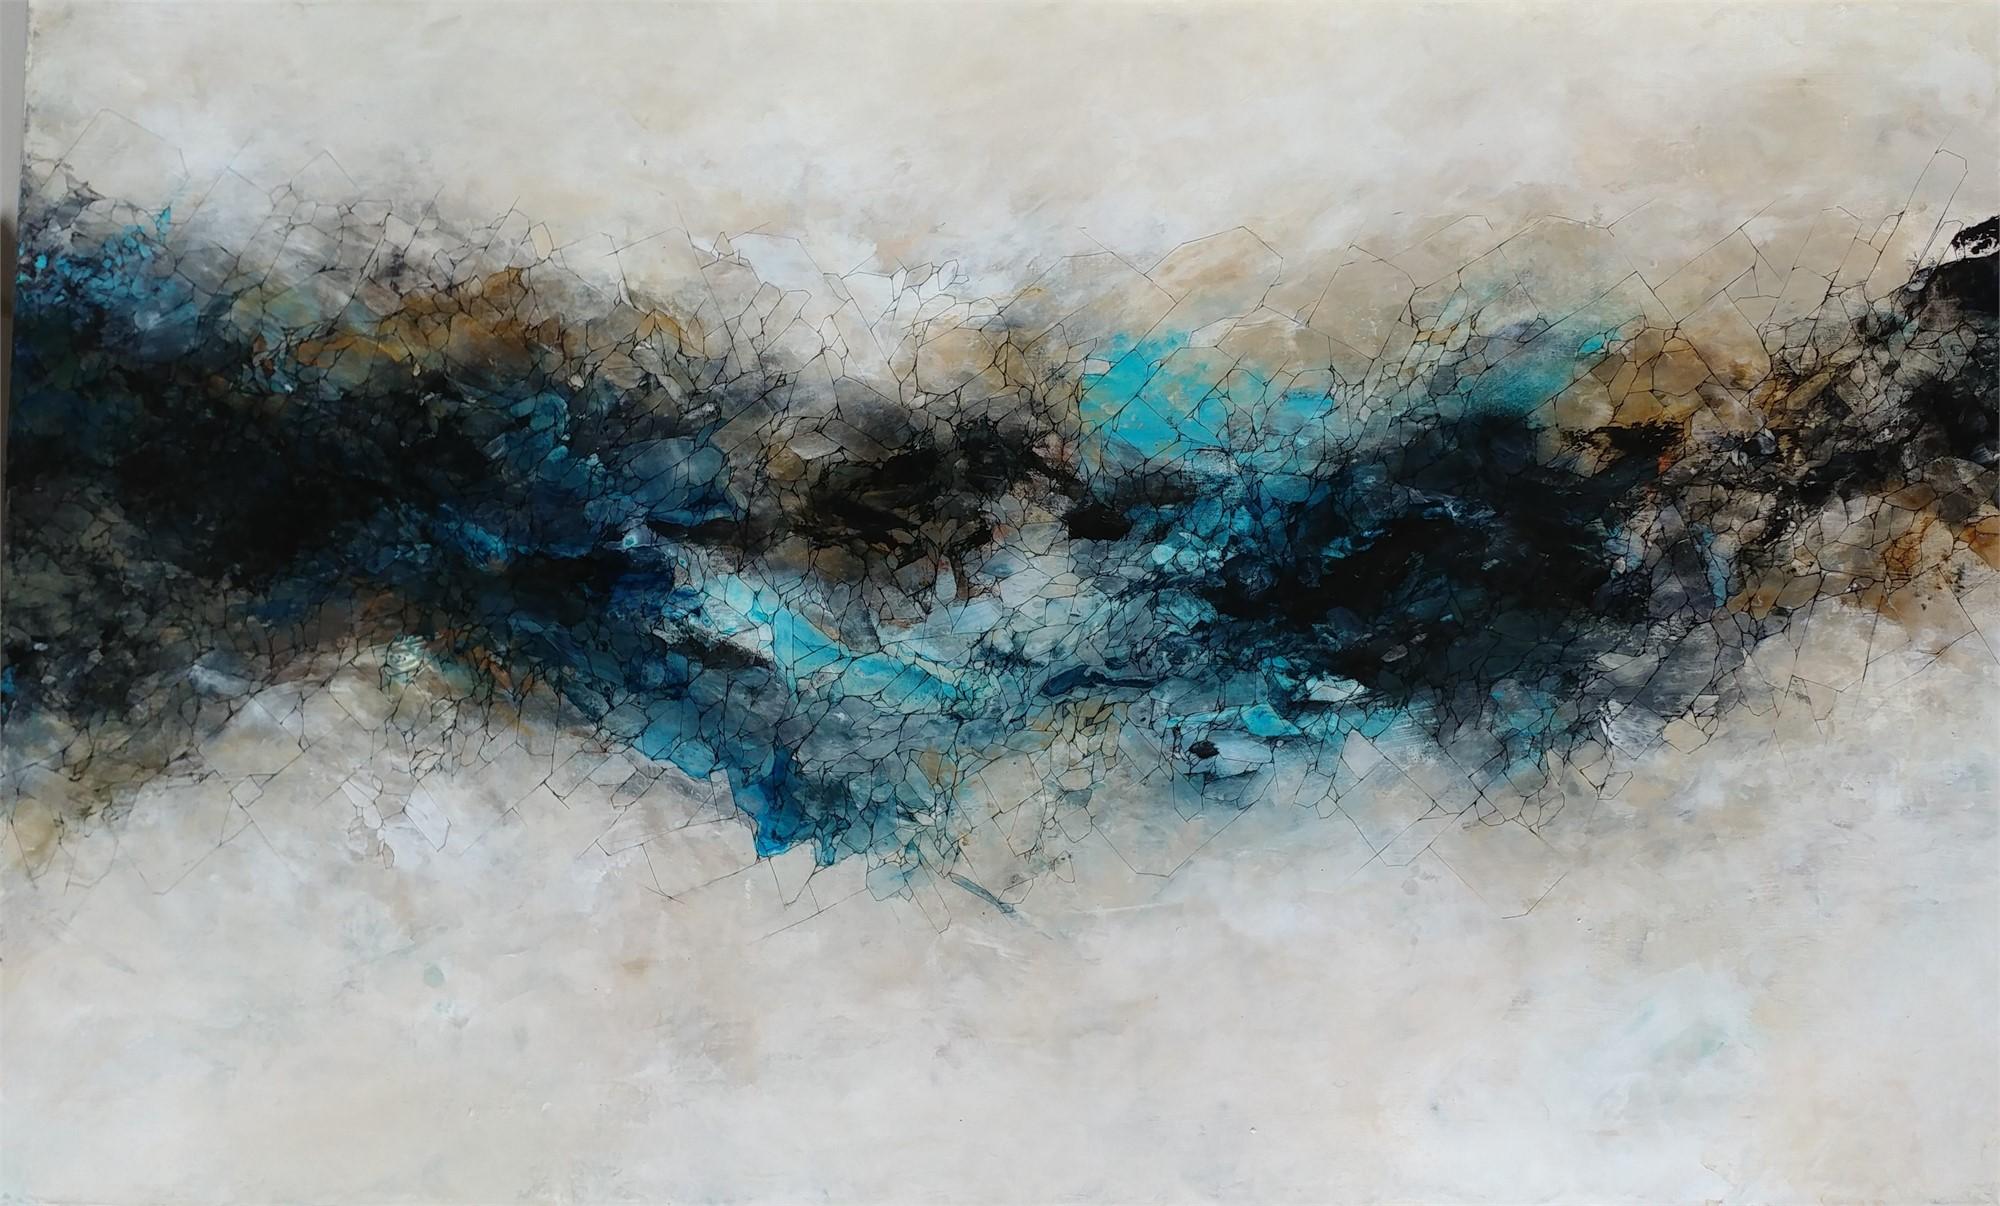 Intertidal IV by Aiden Kringen